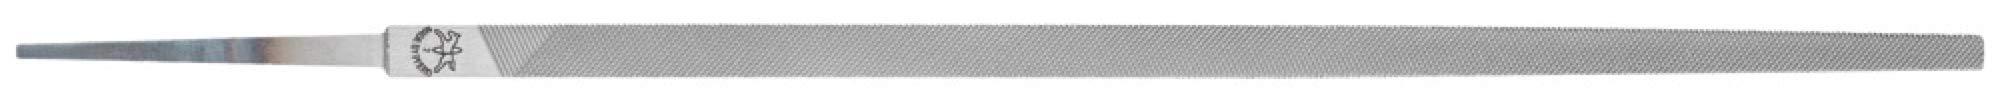 PFERD 11091 10'' Square File Second Cut (10pk)